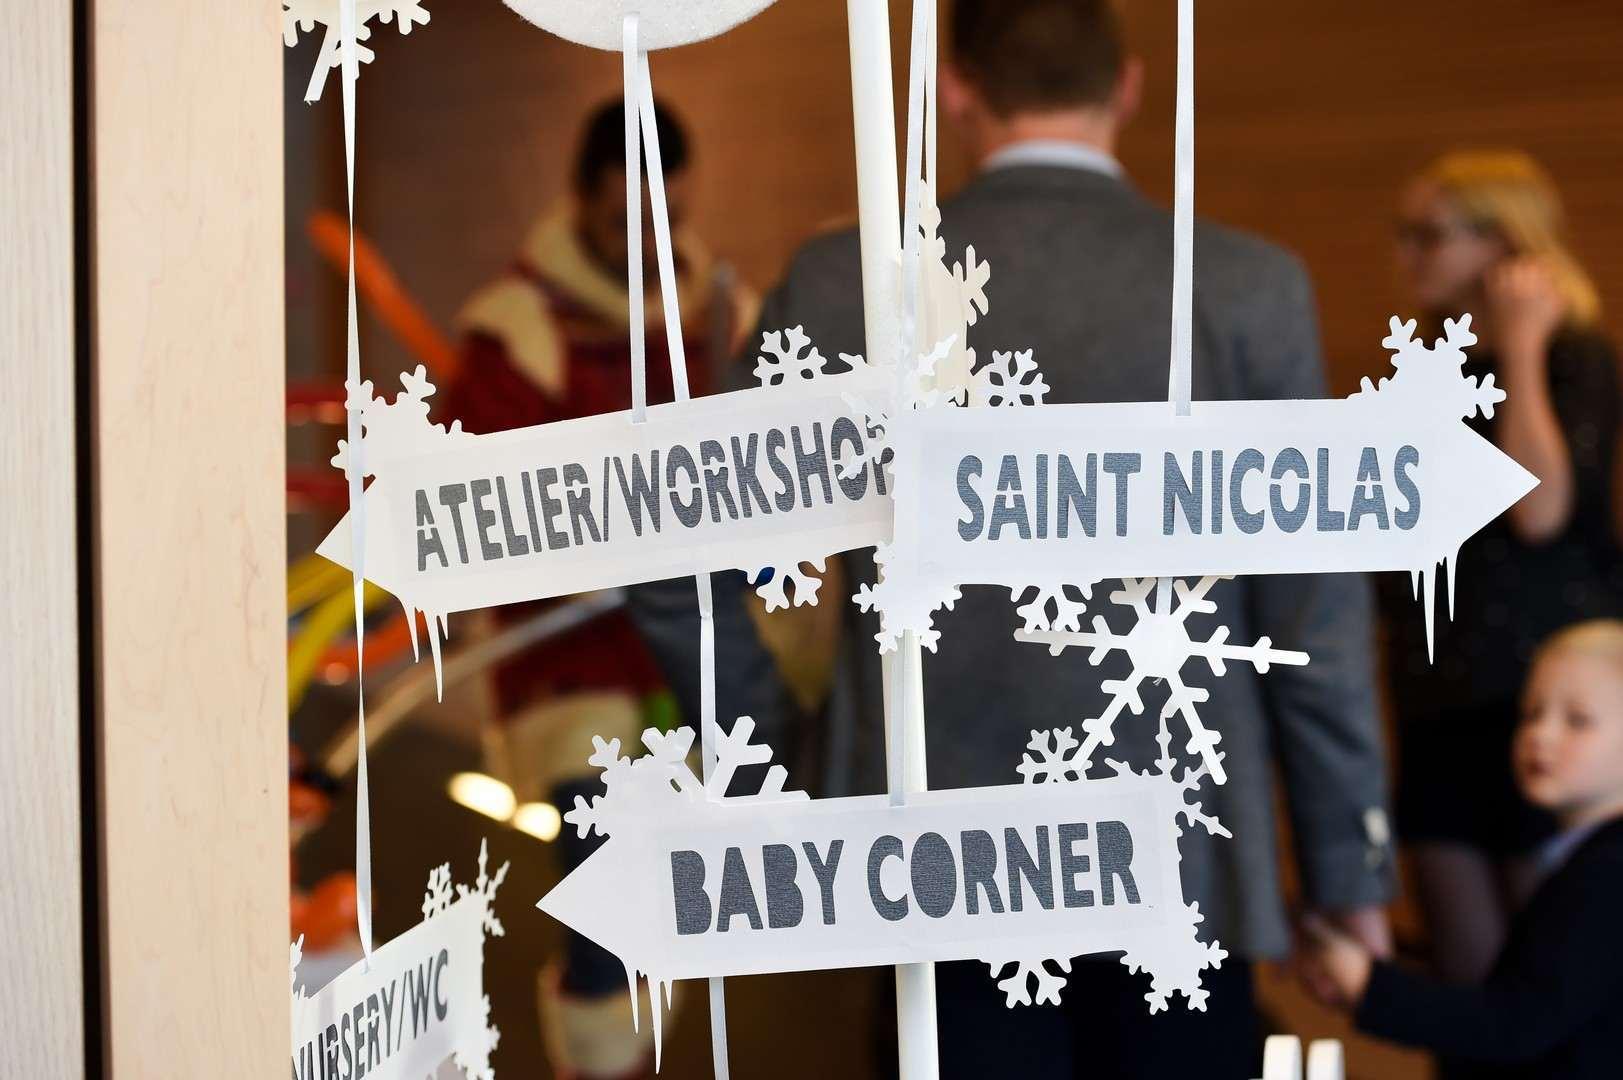 saint-nicolas-intertrust-2017-events-atelier-lux